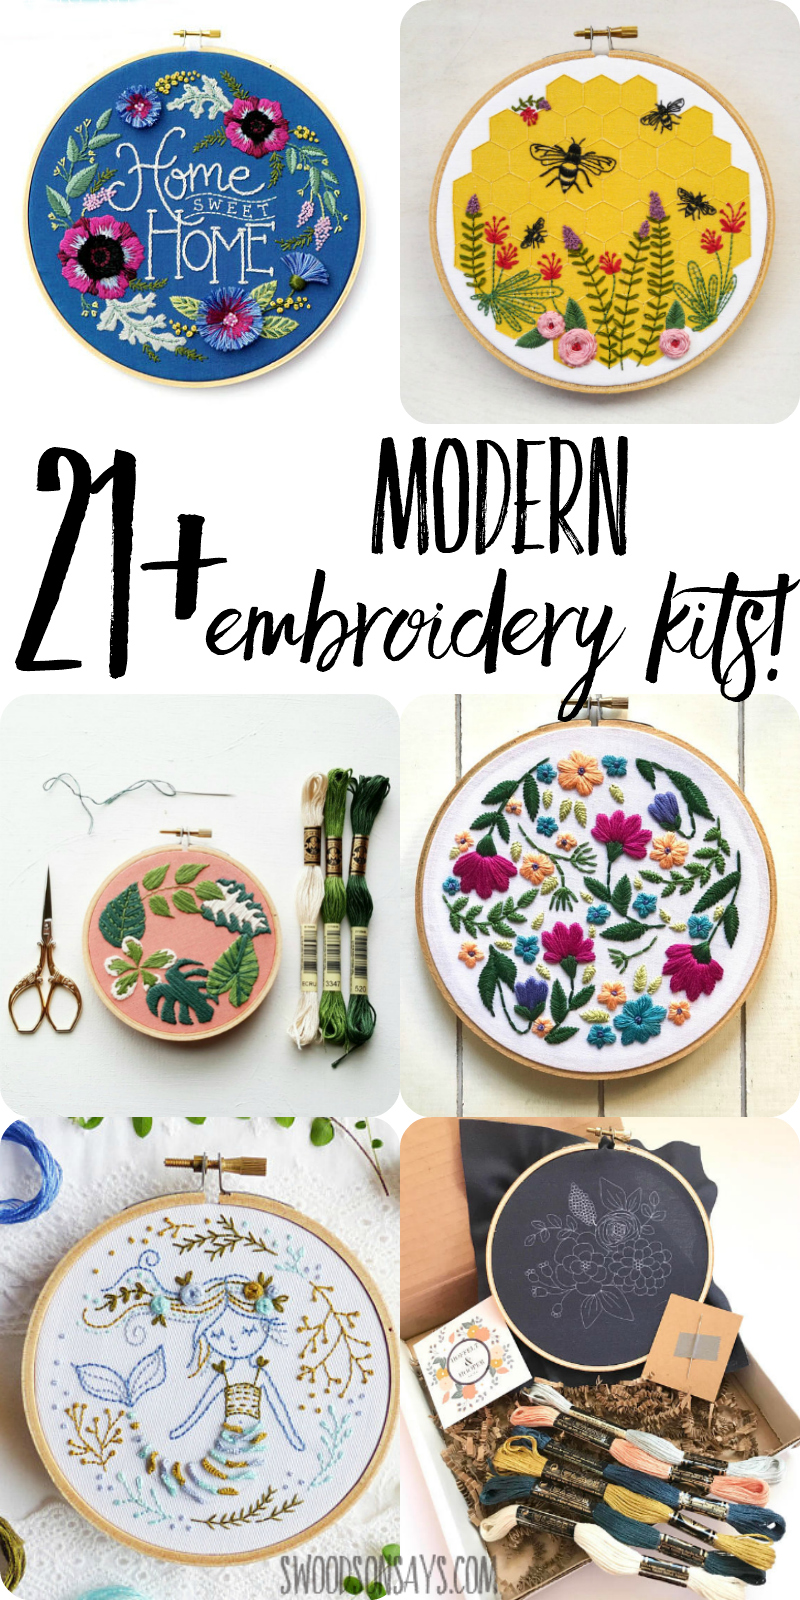 Modern Embroidery Kits For Beginners U2013 OBSiGeN